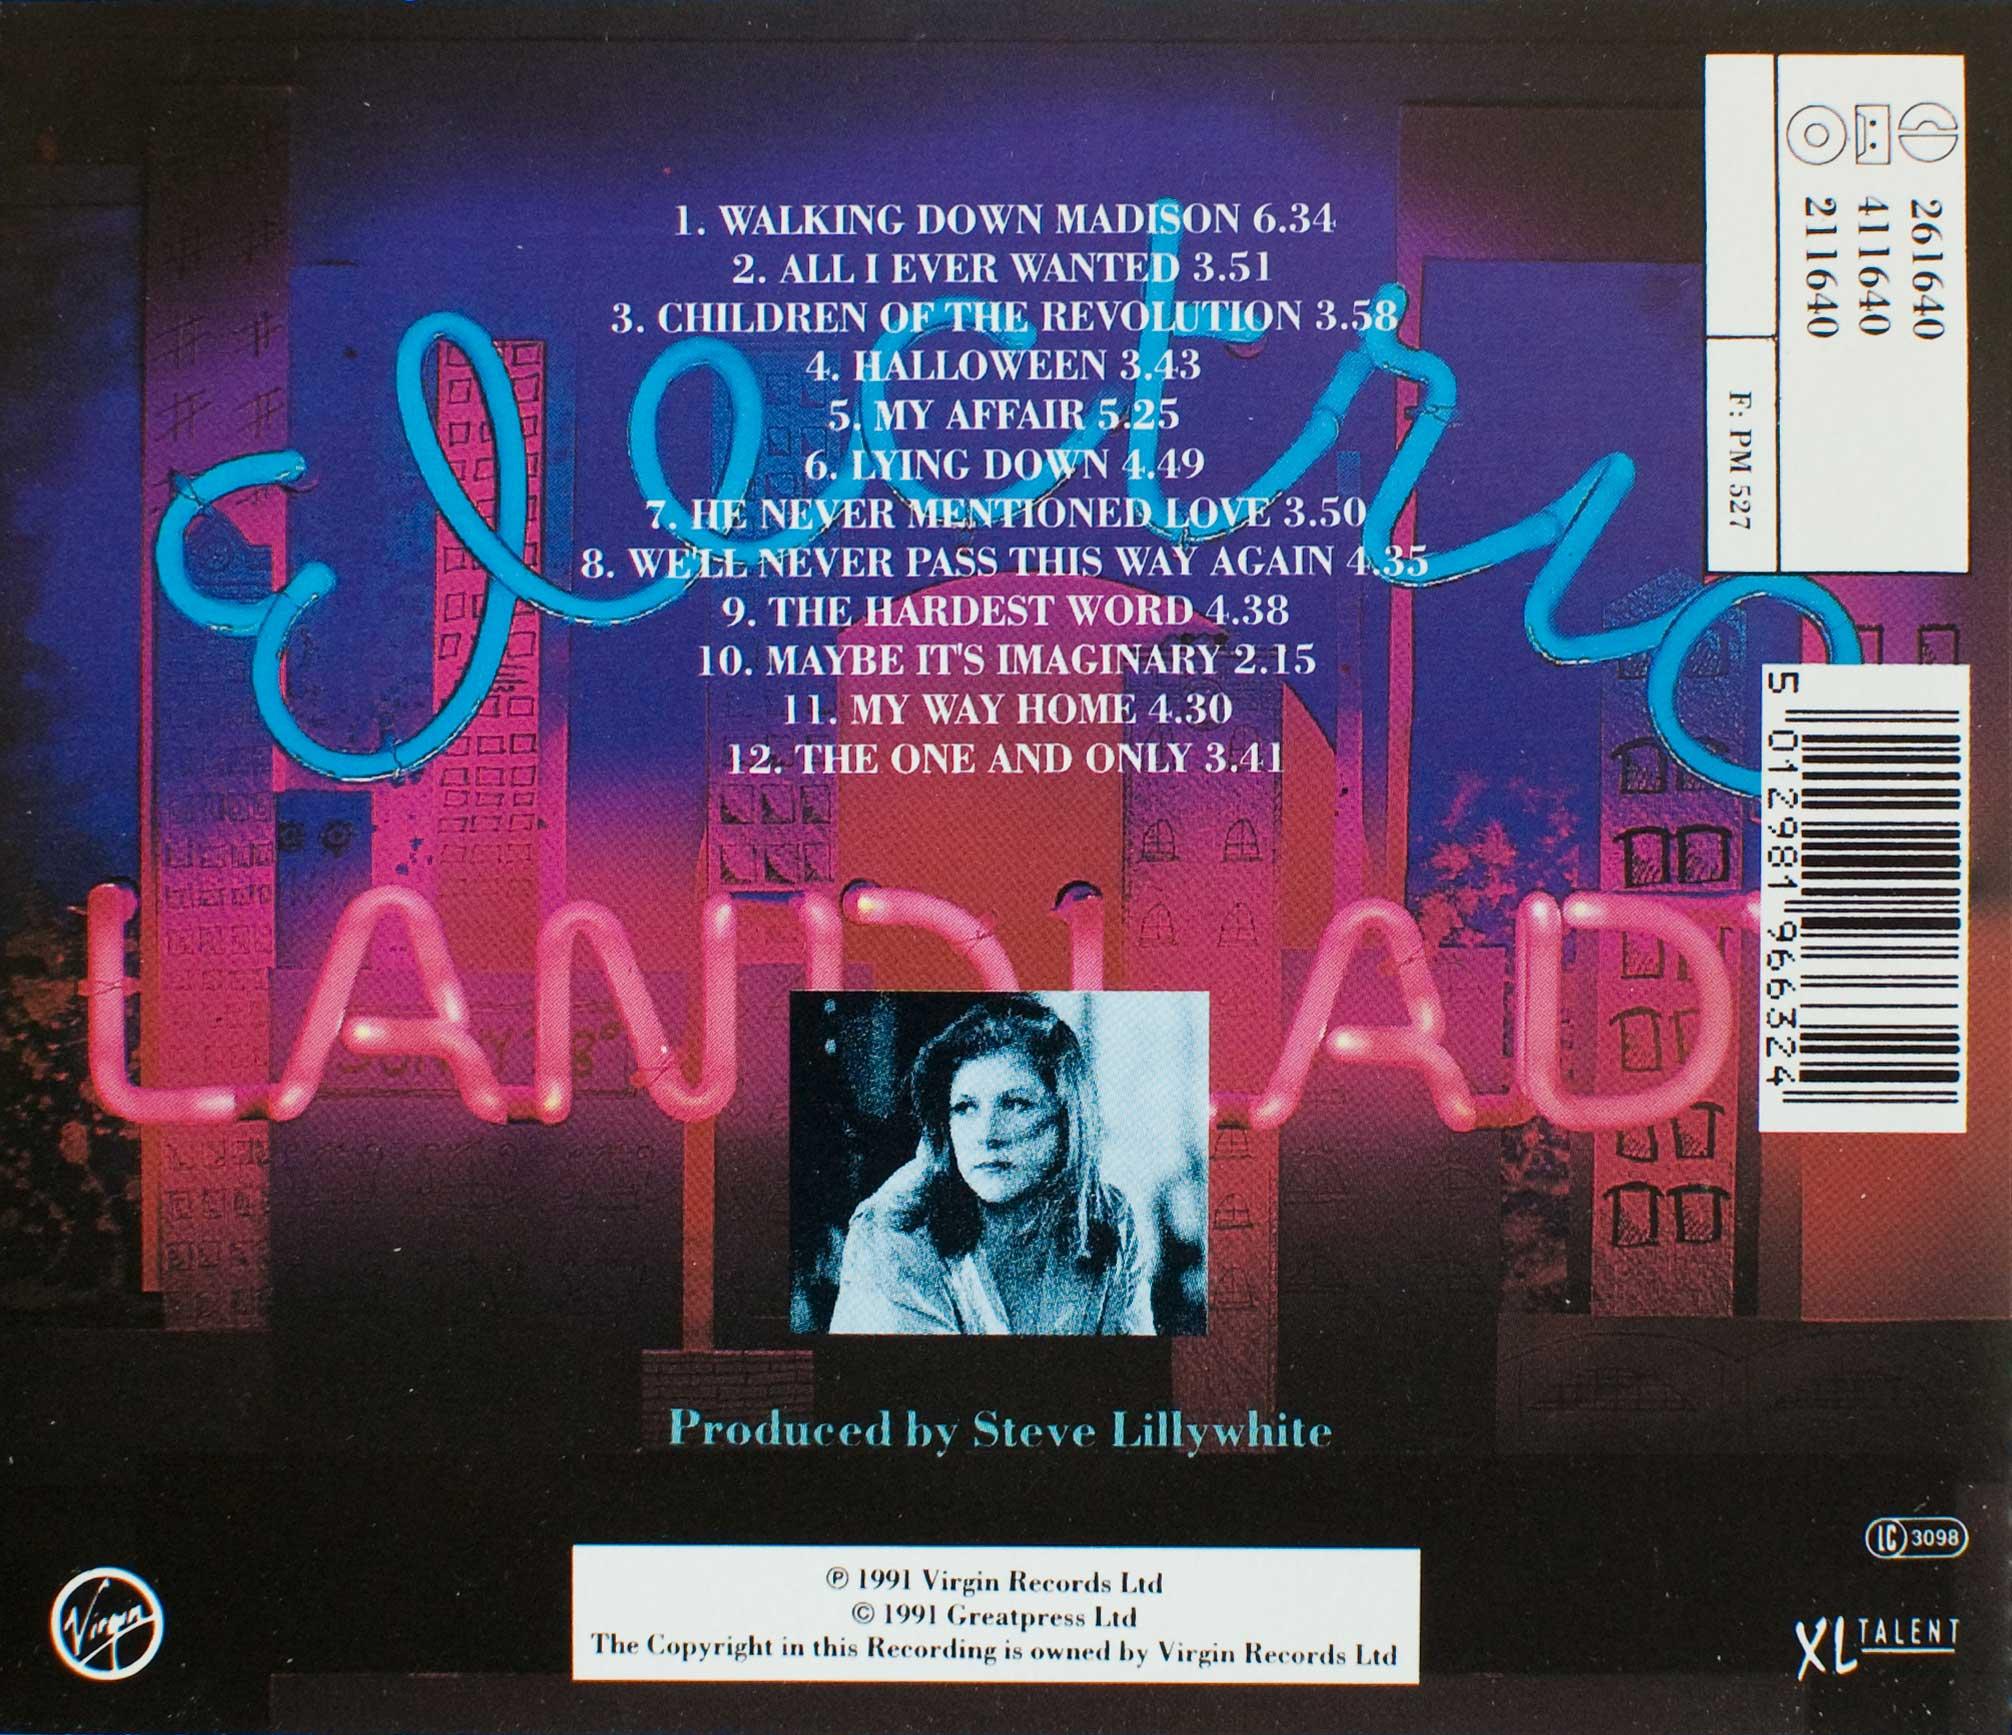 Electric Landlady (1991 CD) back cover